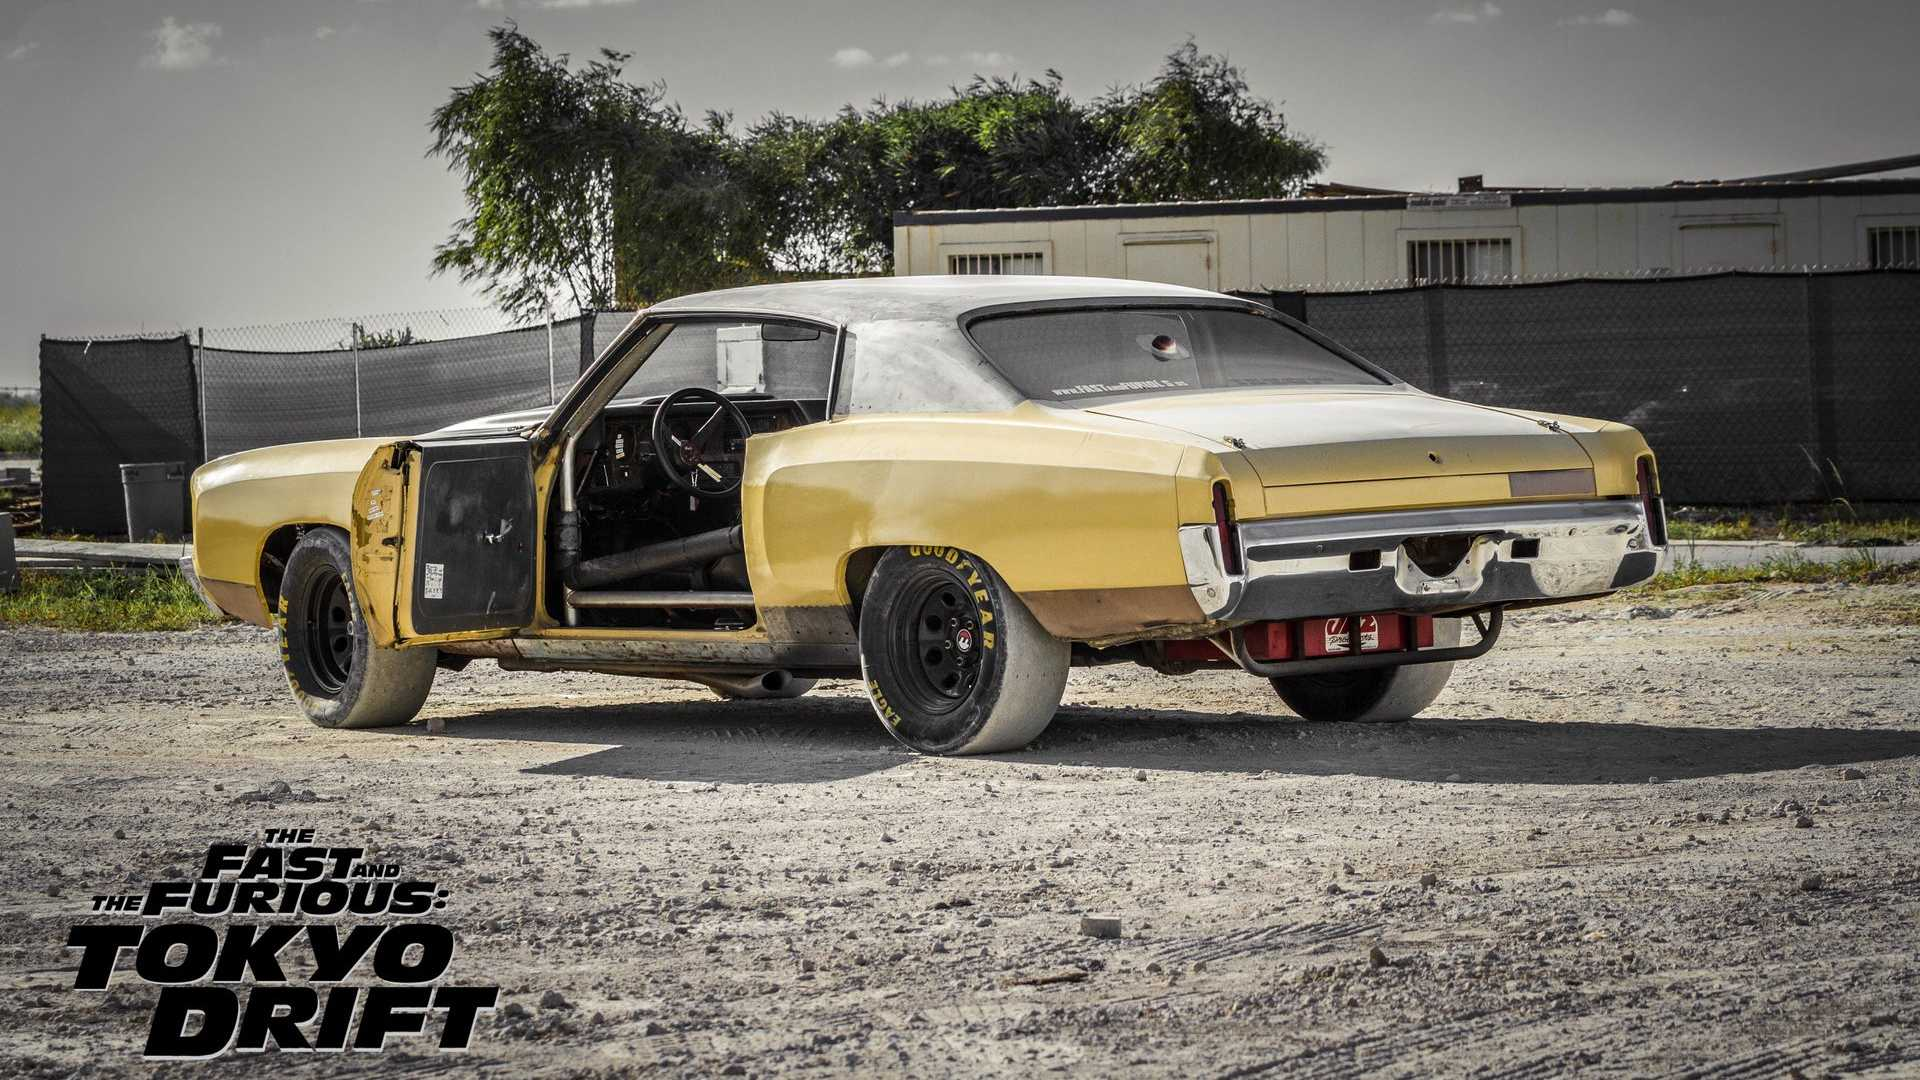 Chevrolet Monte Carlo, 1971, Velocidade Furiosa